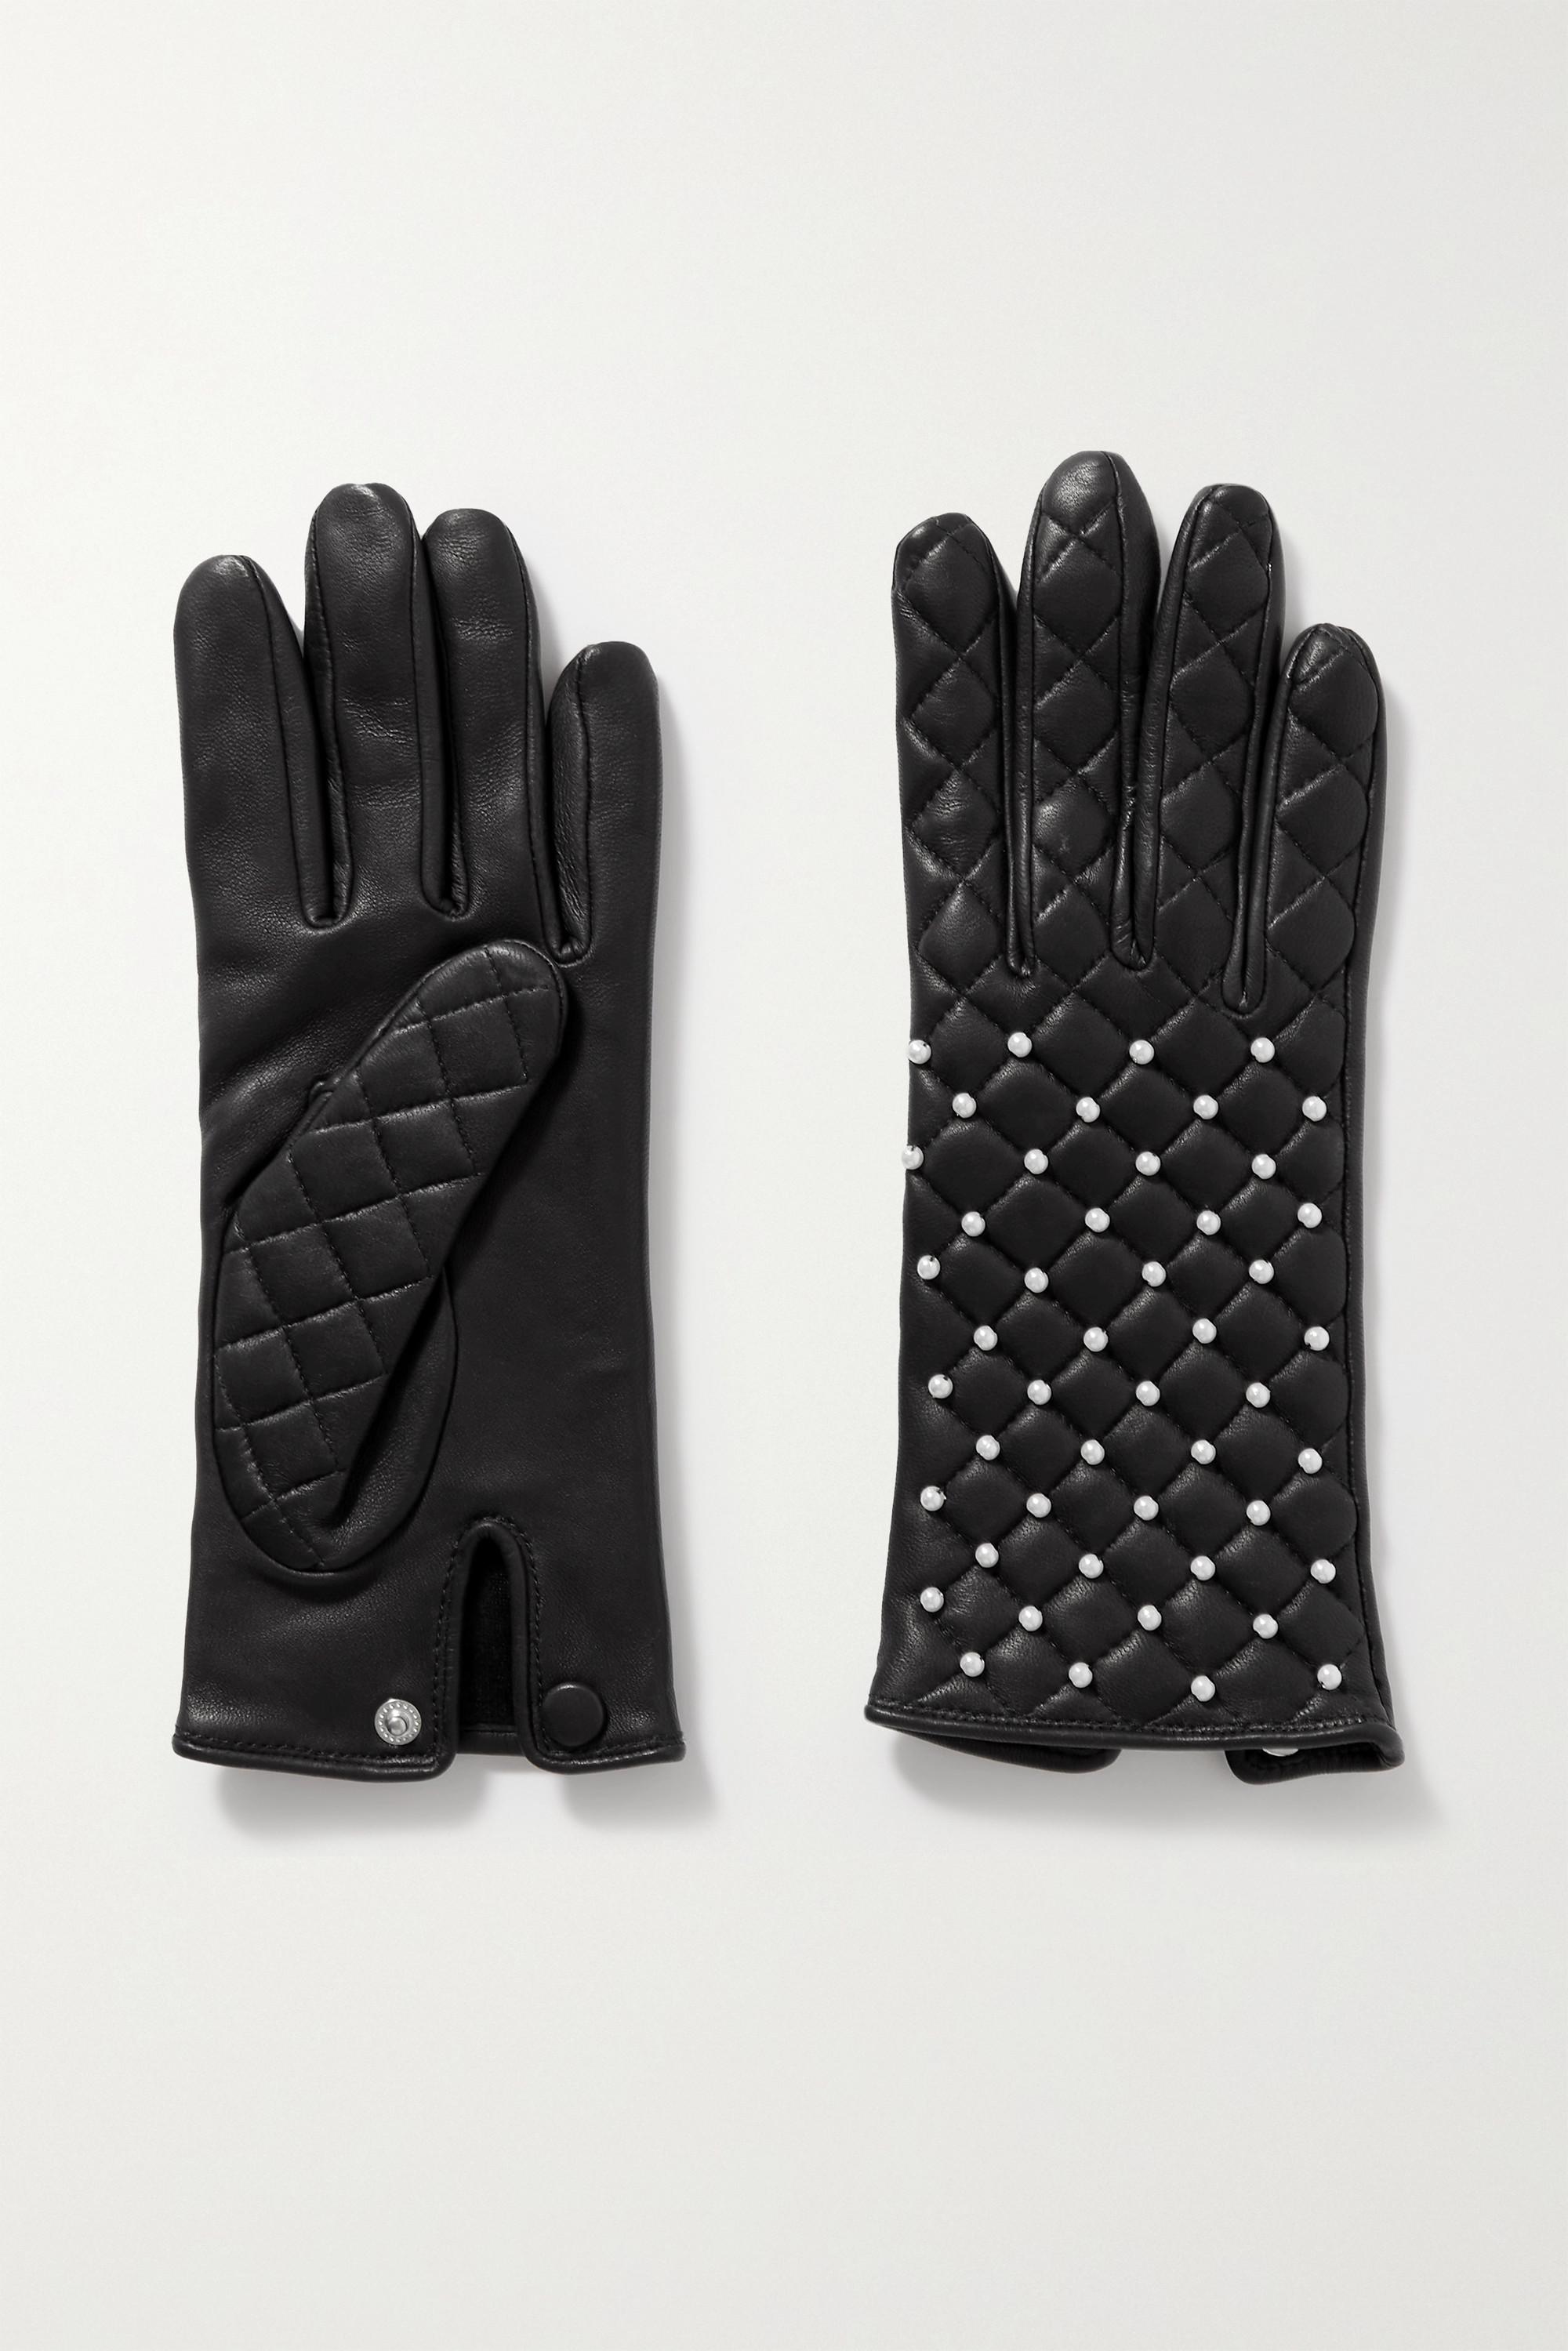 Agnelle Chloe Handschuhe aus gestepptem Leder mit Kunstperlen